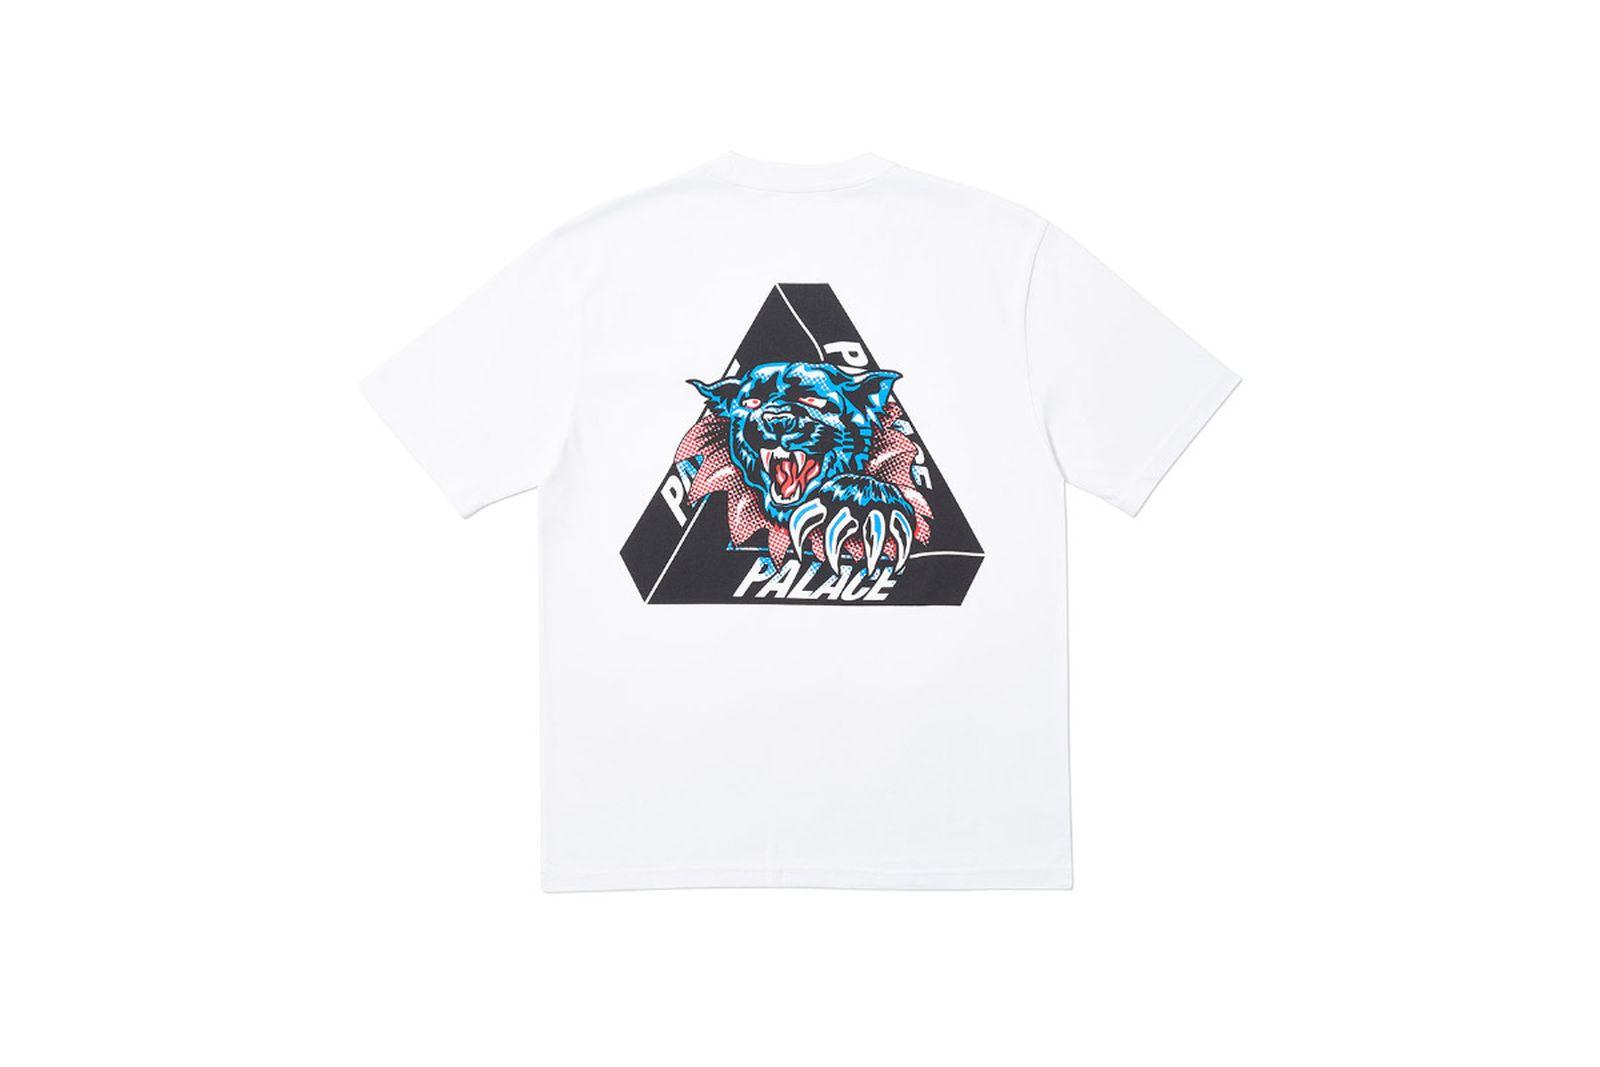 Palace 2019 Autumn T Shirt Ripped white back